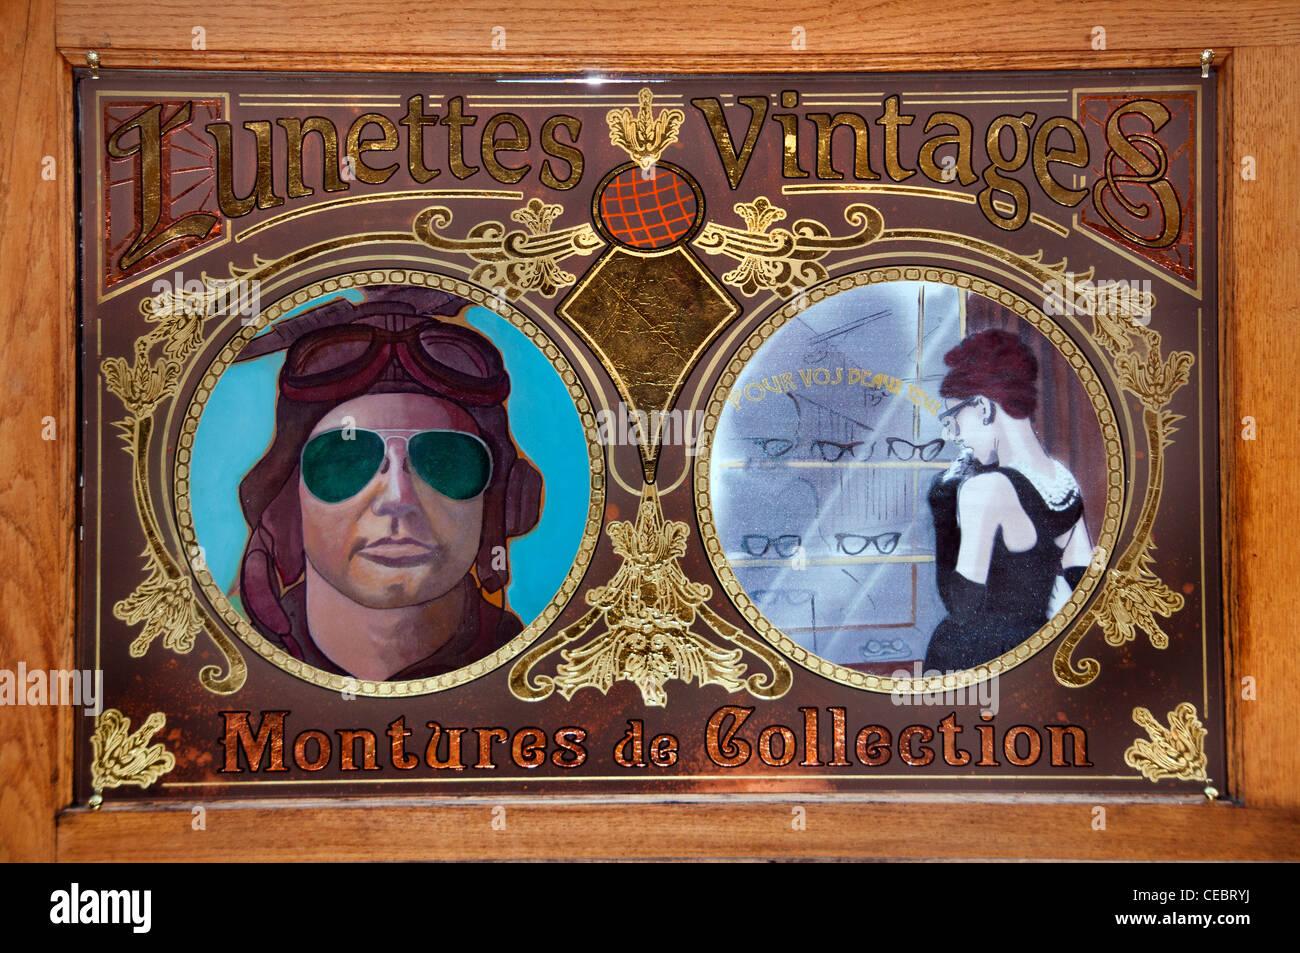 Pour Vos Beaux Yeux optician vintages collections Gallery - Galerie Vivienne Paris France French - Stock Image